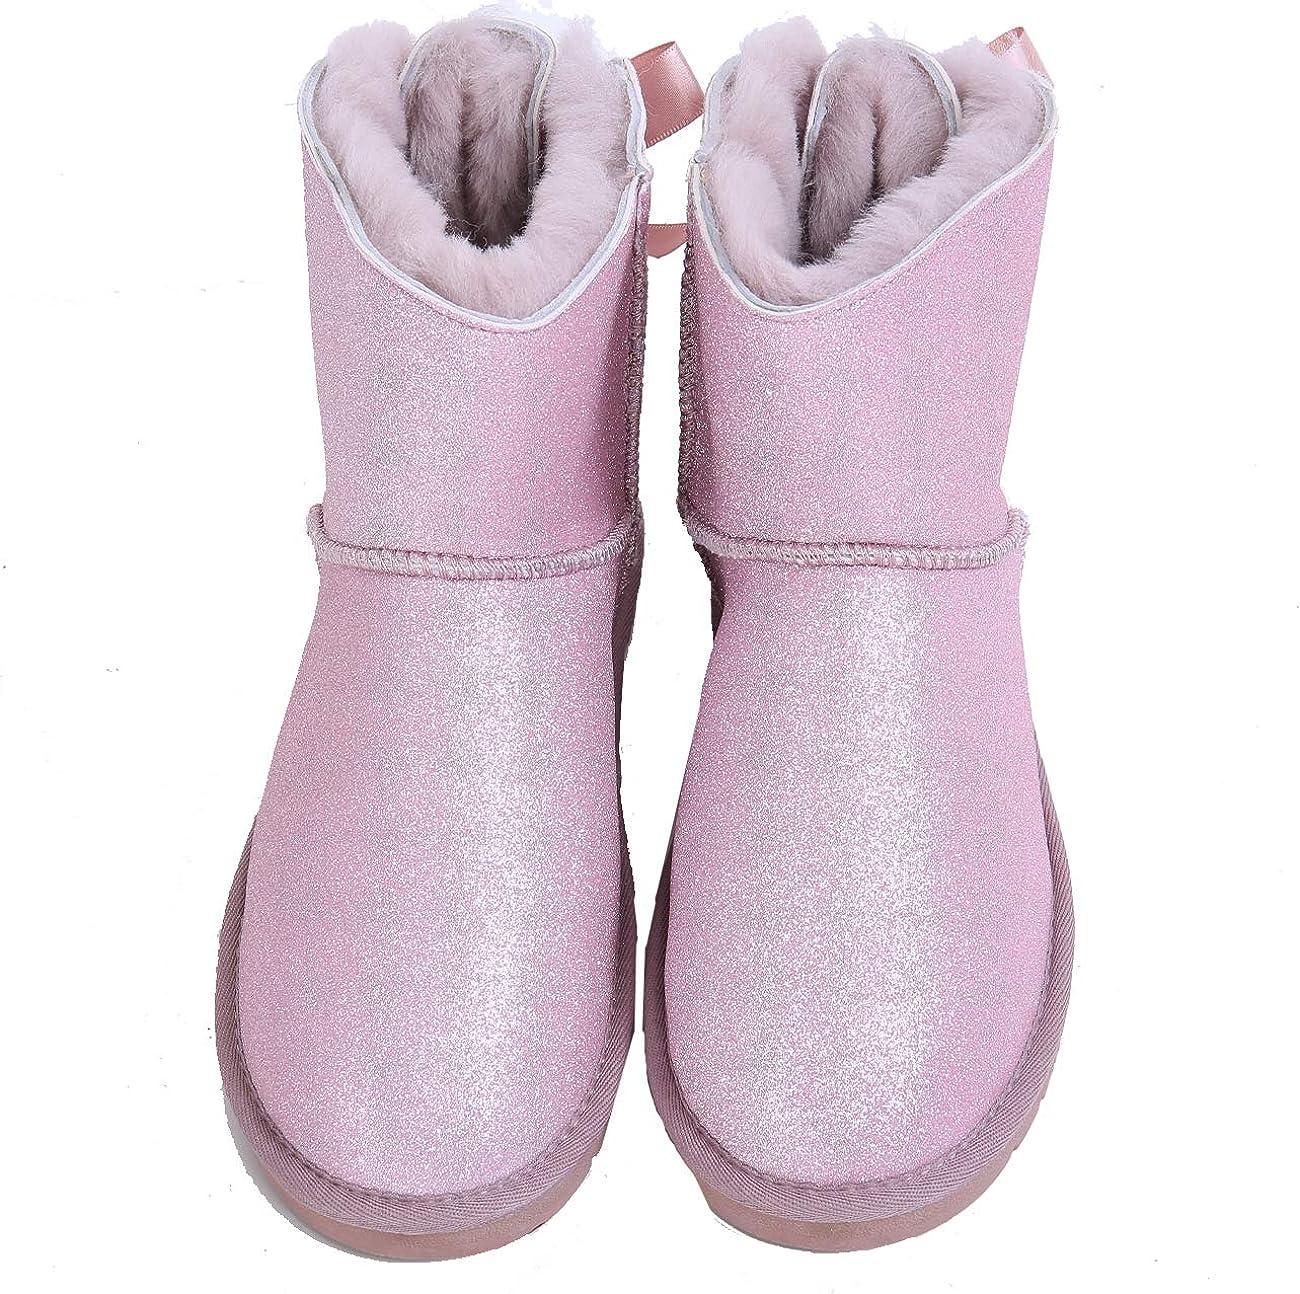 Women's 送料無料(一部地域を除く) Snow Boots Waterproof Winter 送料無料 新品 with Genu Bow Fashion